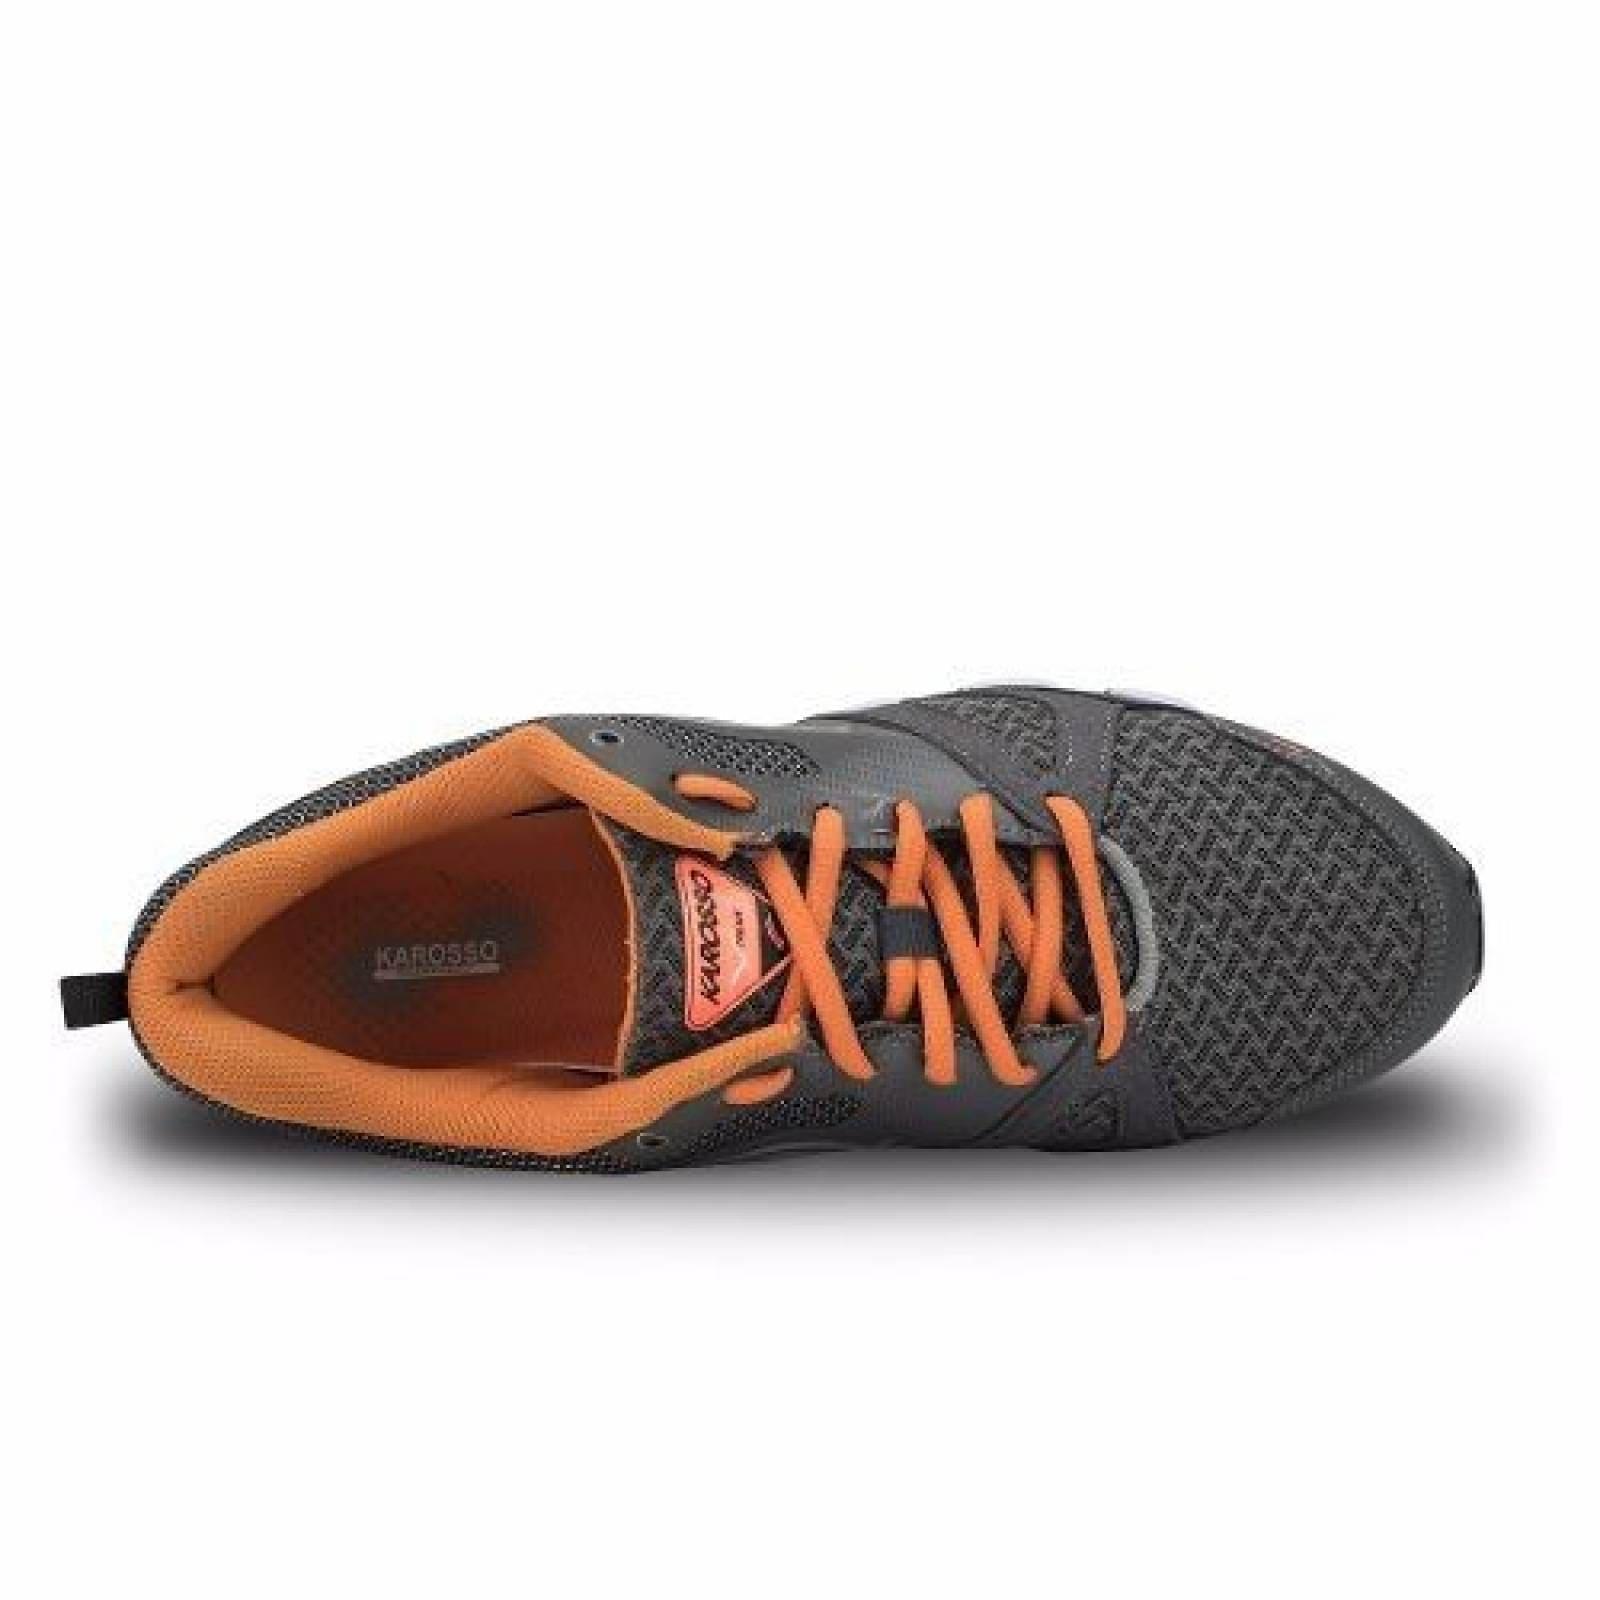 Tenis Para Correr Karosso 6311 Gris Naranja